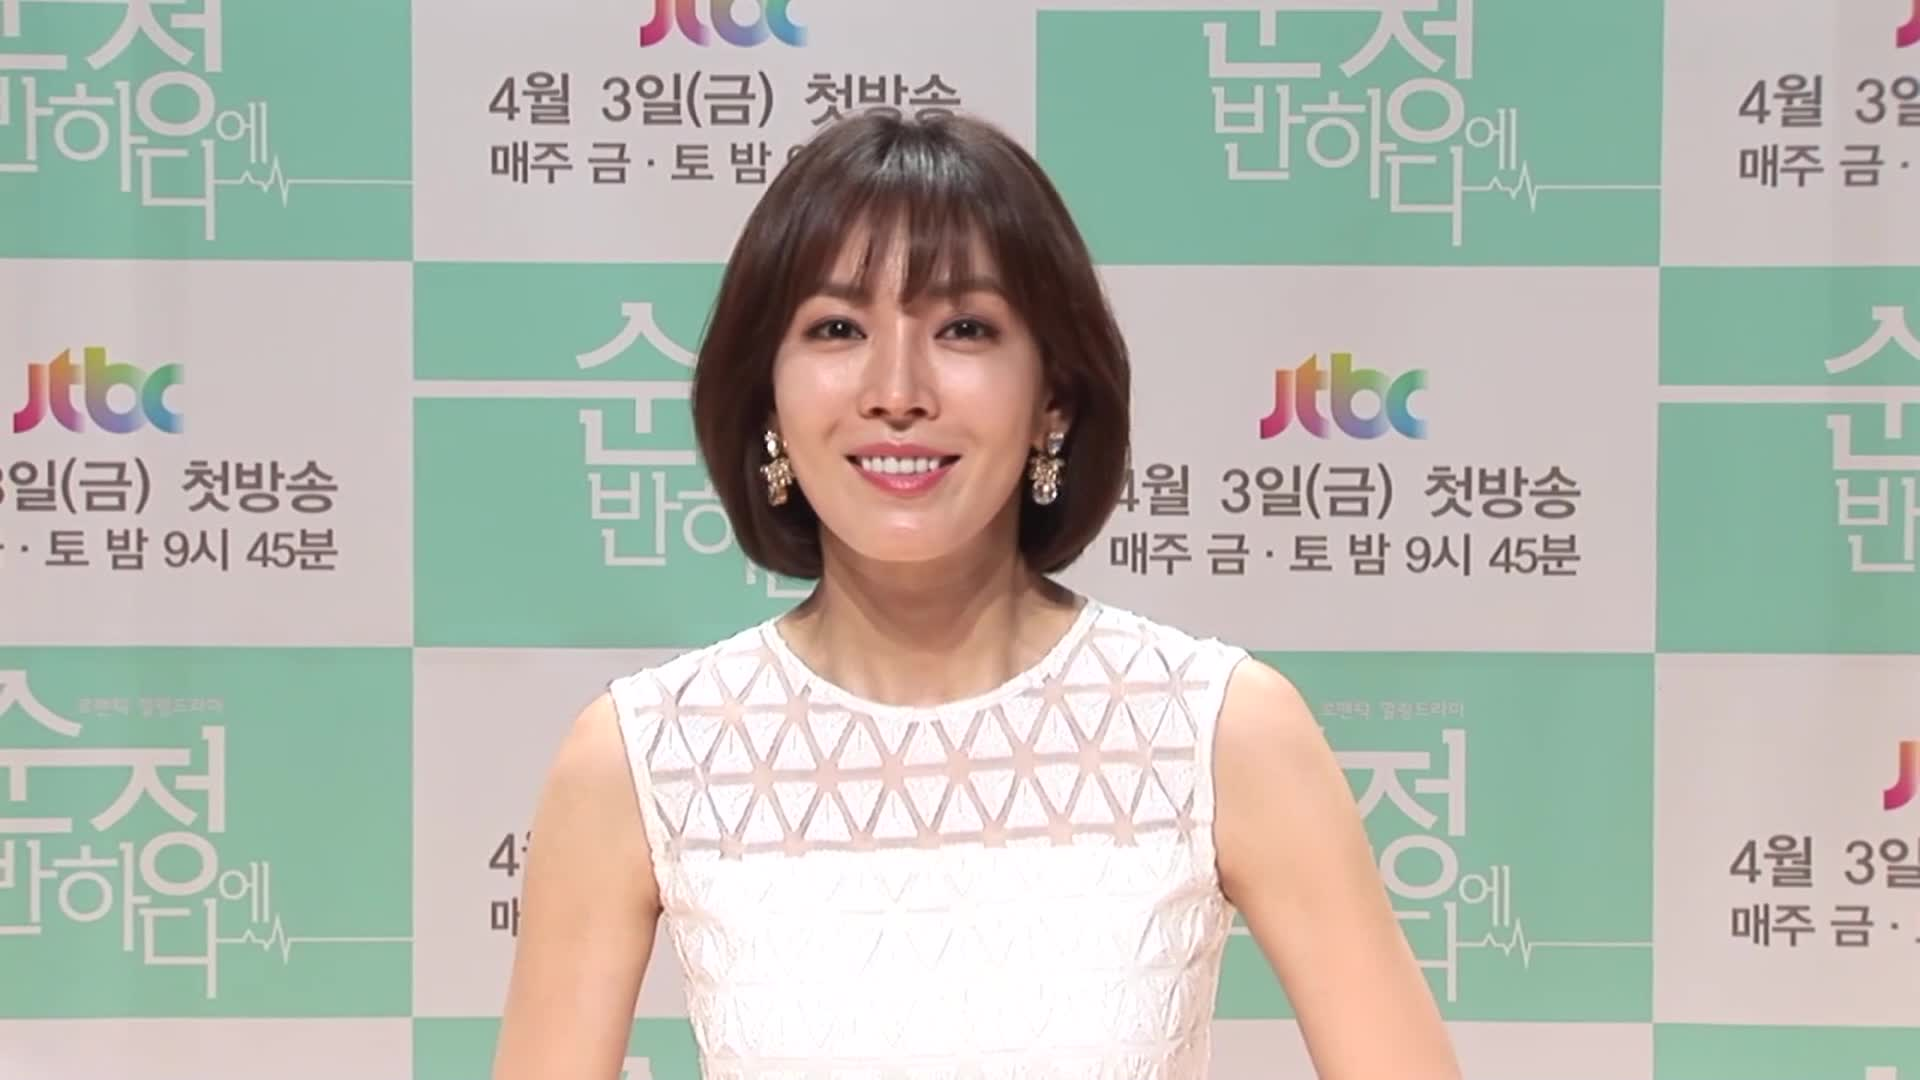 Kim So Yeon's Shoutout to Viki Fans!: Falling for Innocence